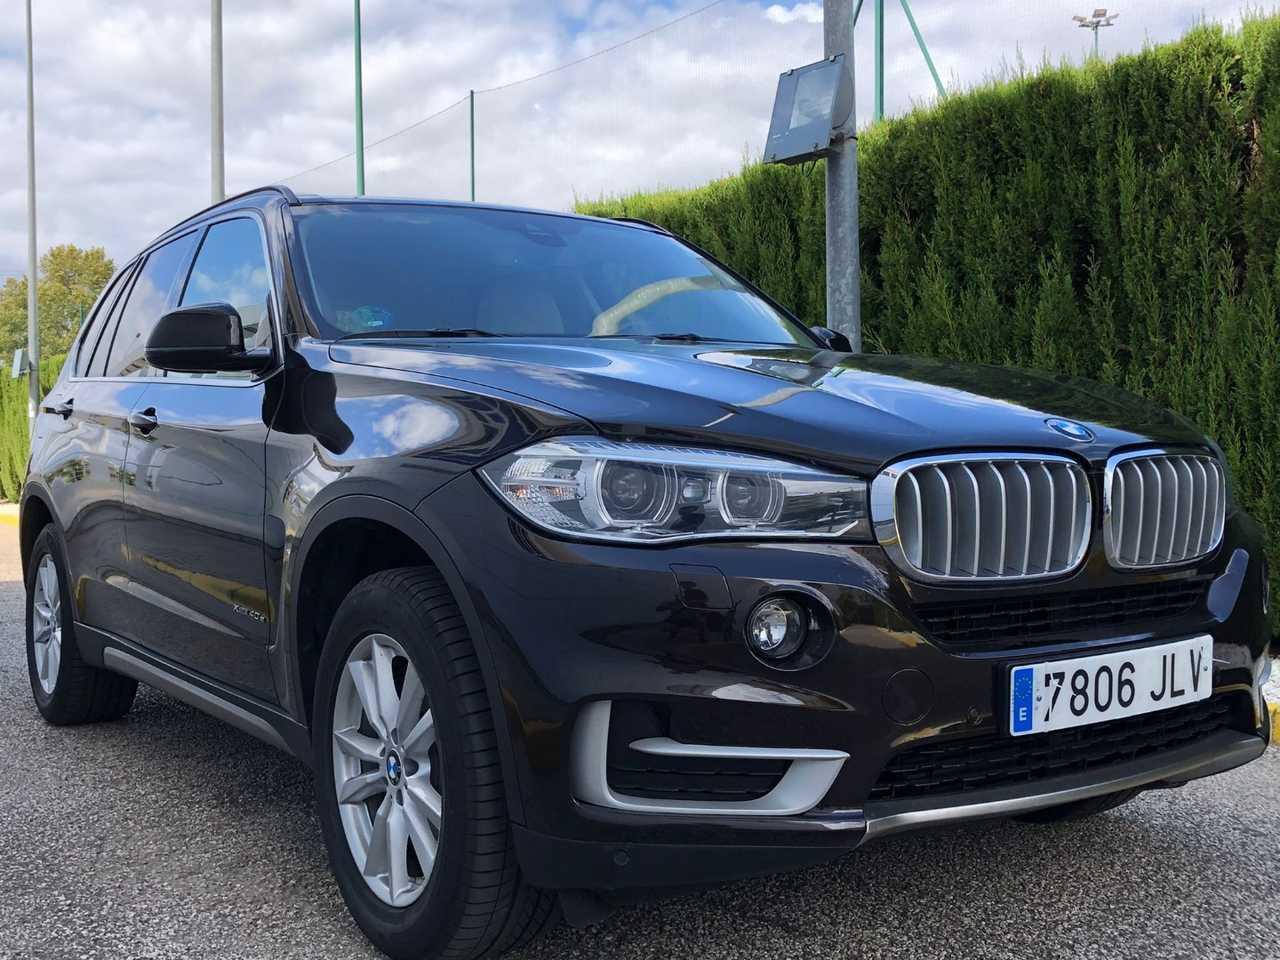 BMW X5 ocasión segunda mano 2016 Híbrido por 34.900€ en Málaga